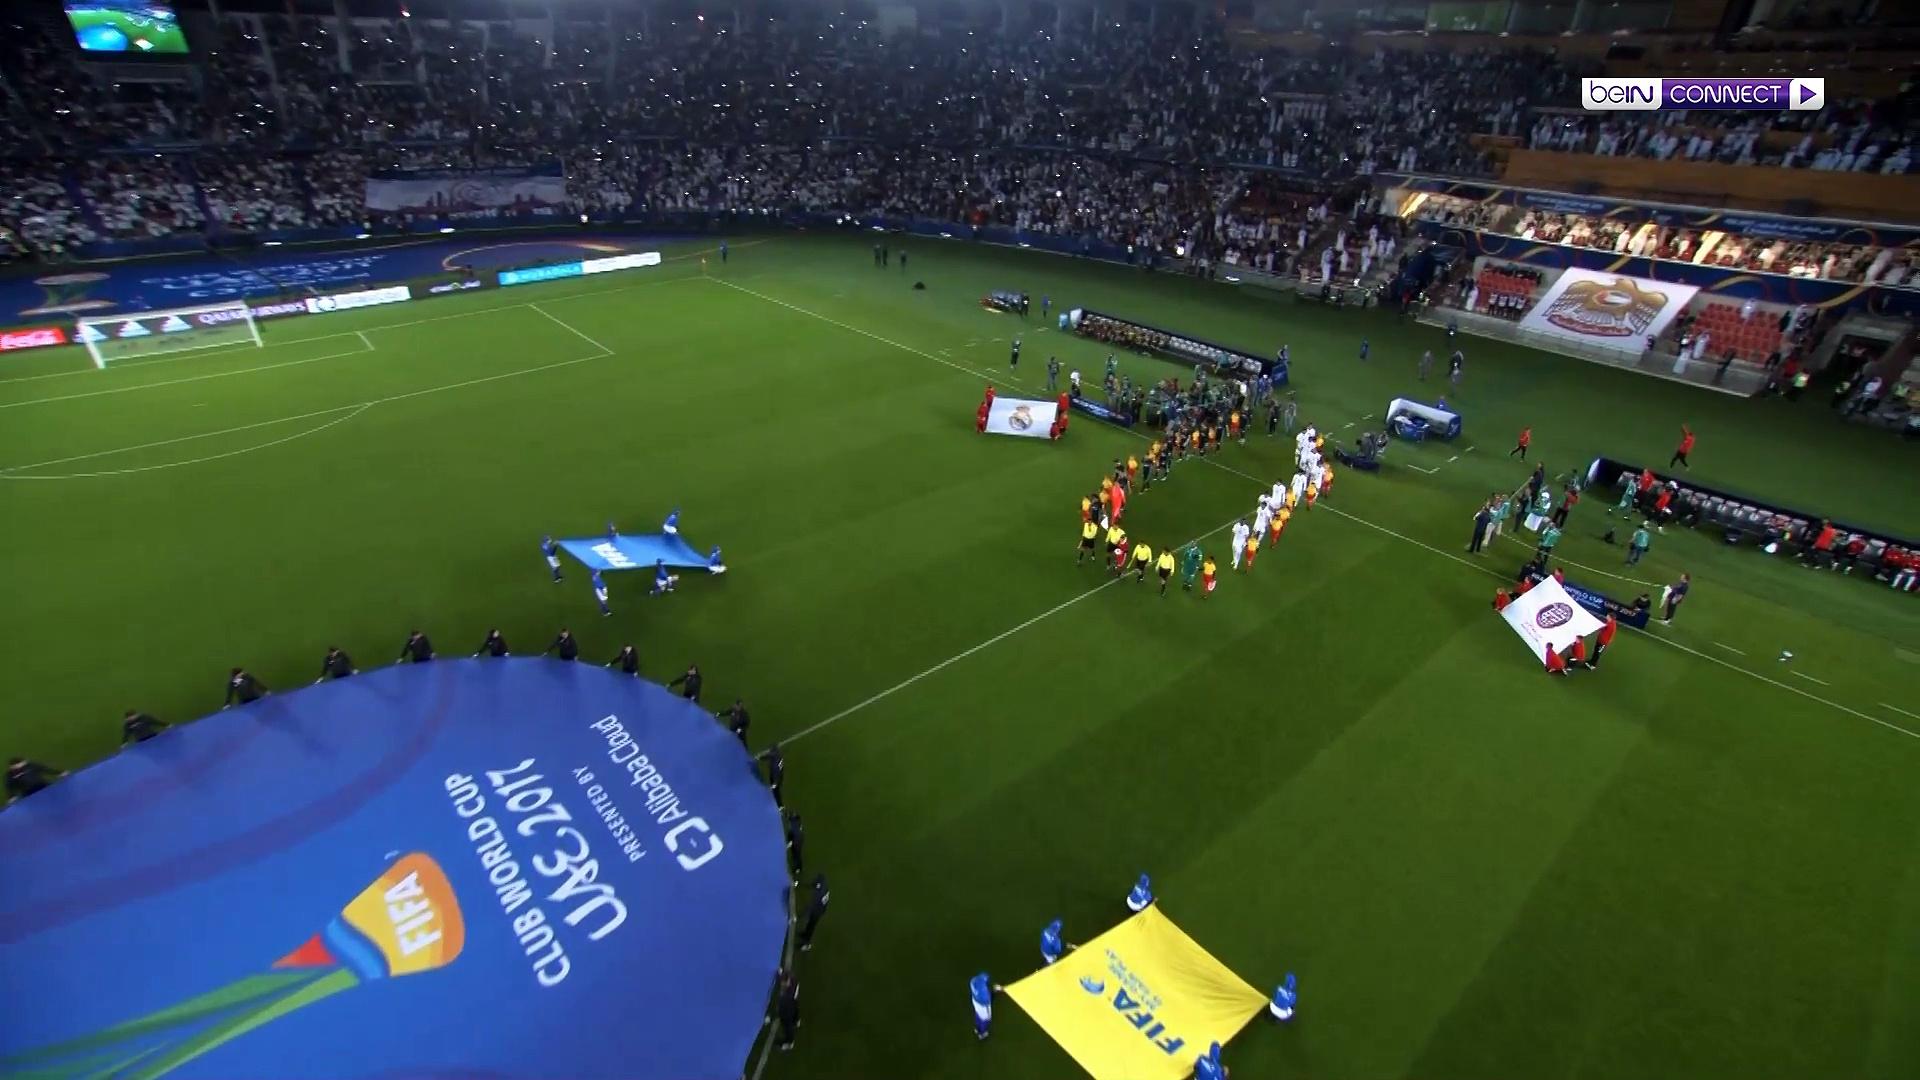 Photo of ريال مدريد بطلا لكأس العالم للأندية.. ورونالدو يعزز رقمه القياسي